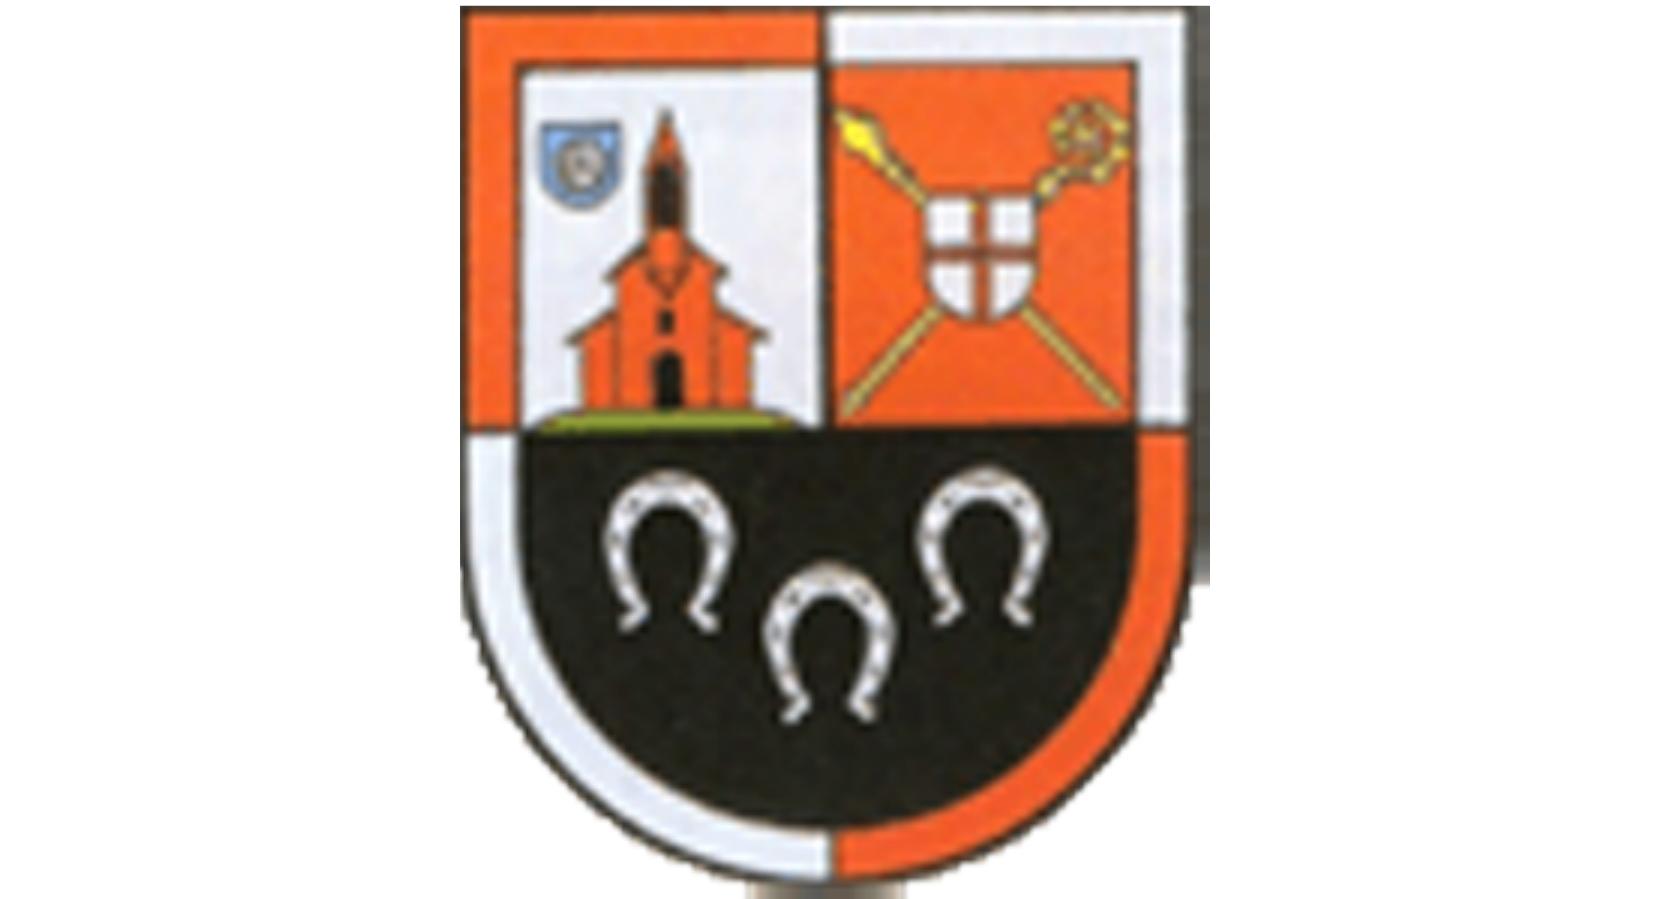 Verbandsgemeindeverwaltung